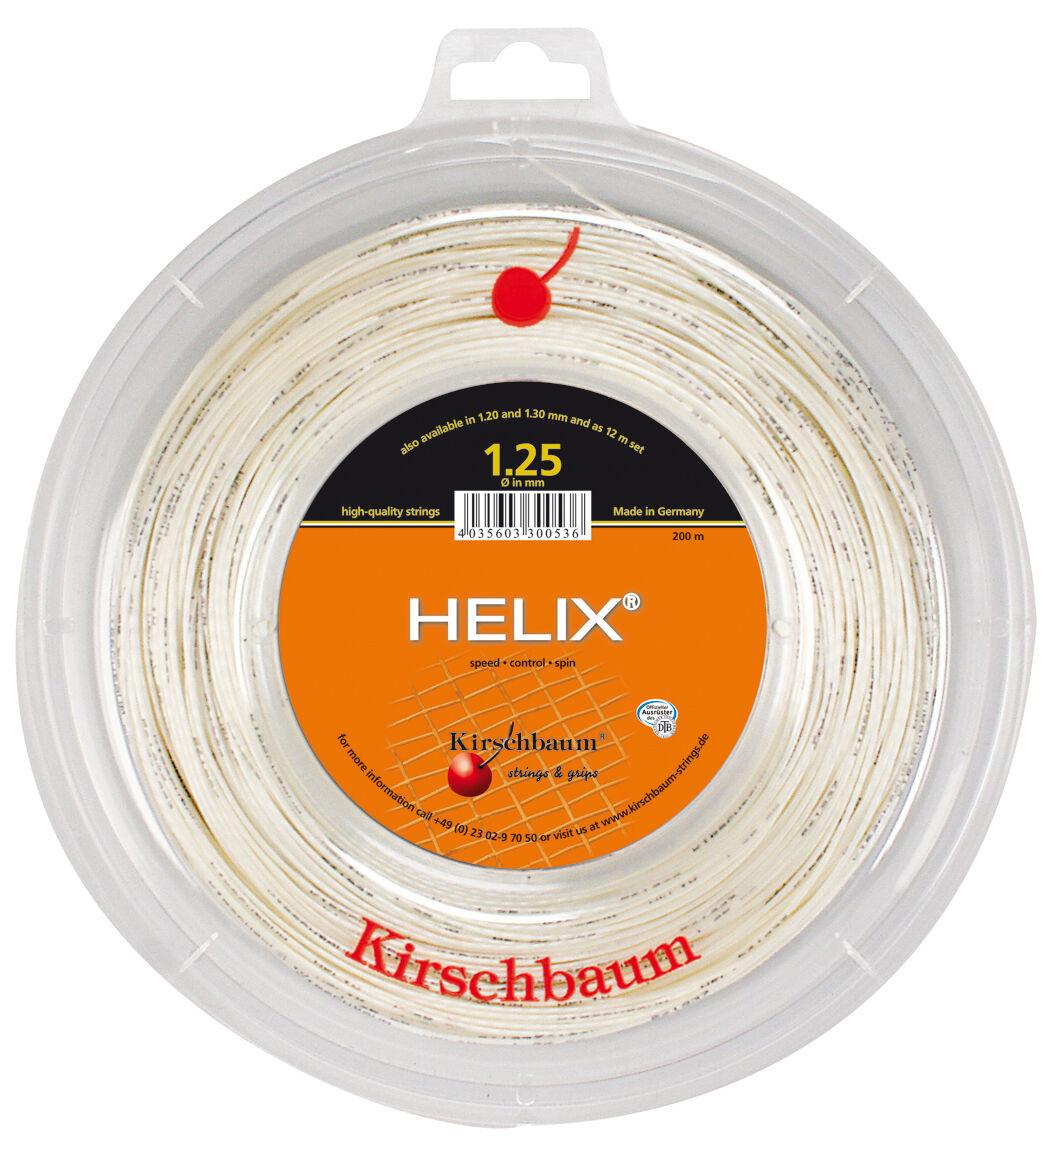 Kirschbaum Kirschbaum Kirschbaum HELIX - 200 Meter Rolle 453526